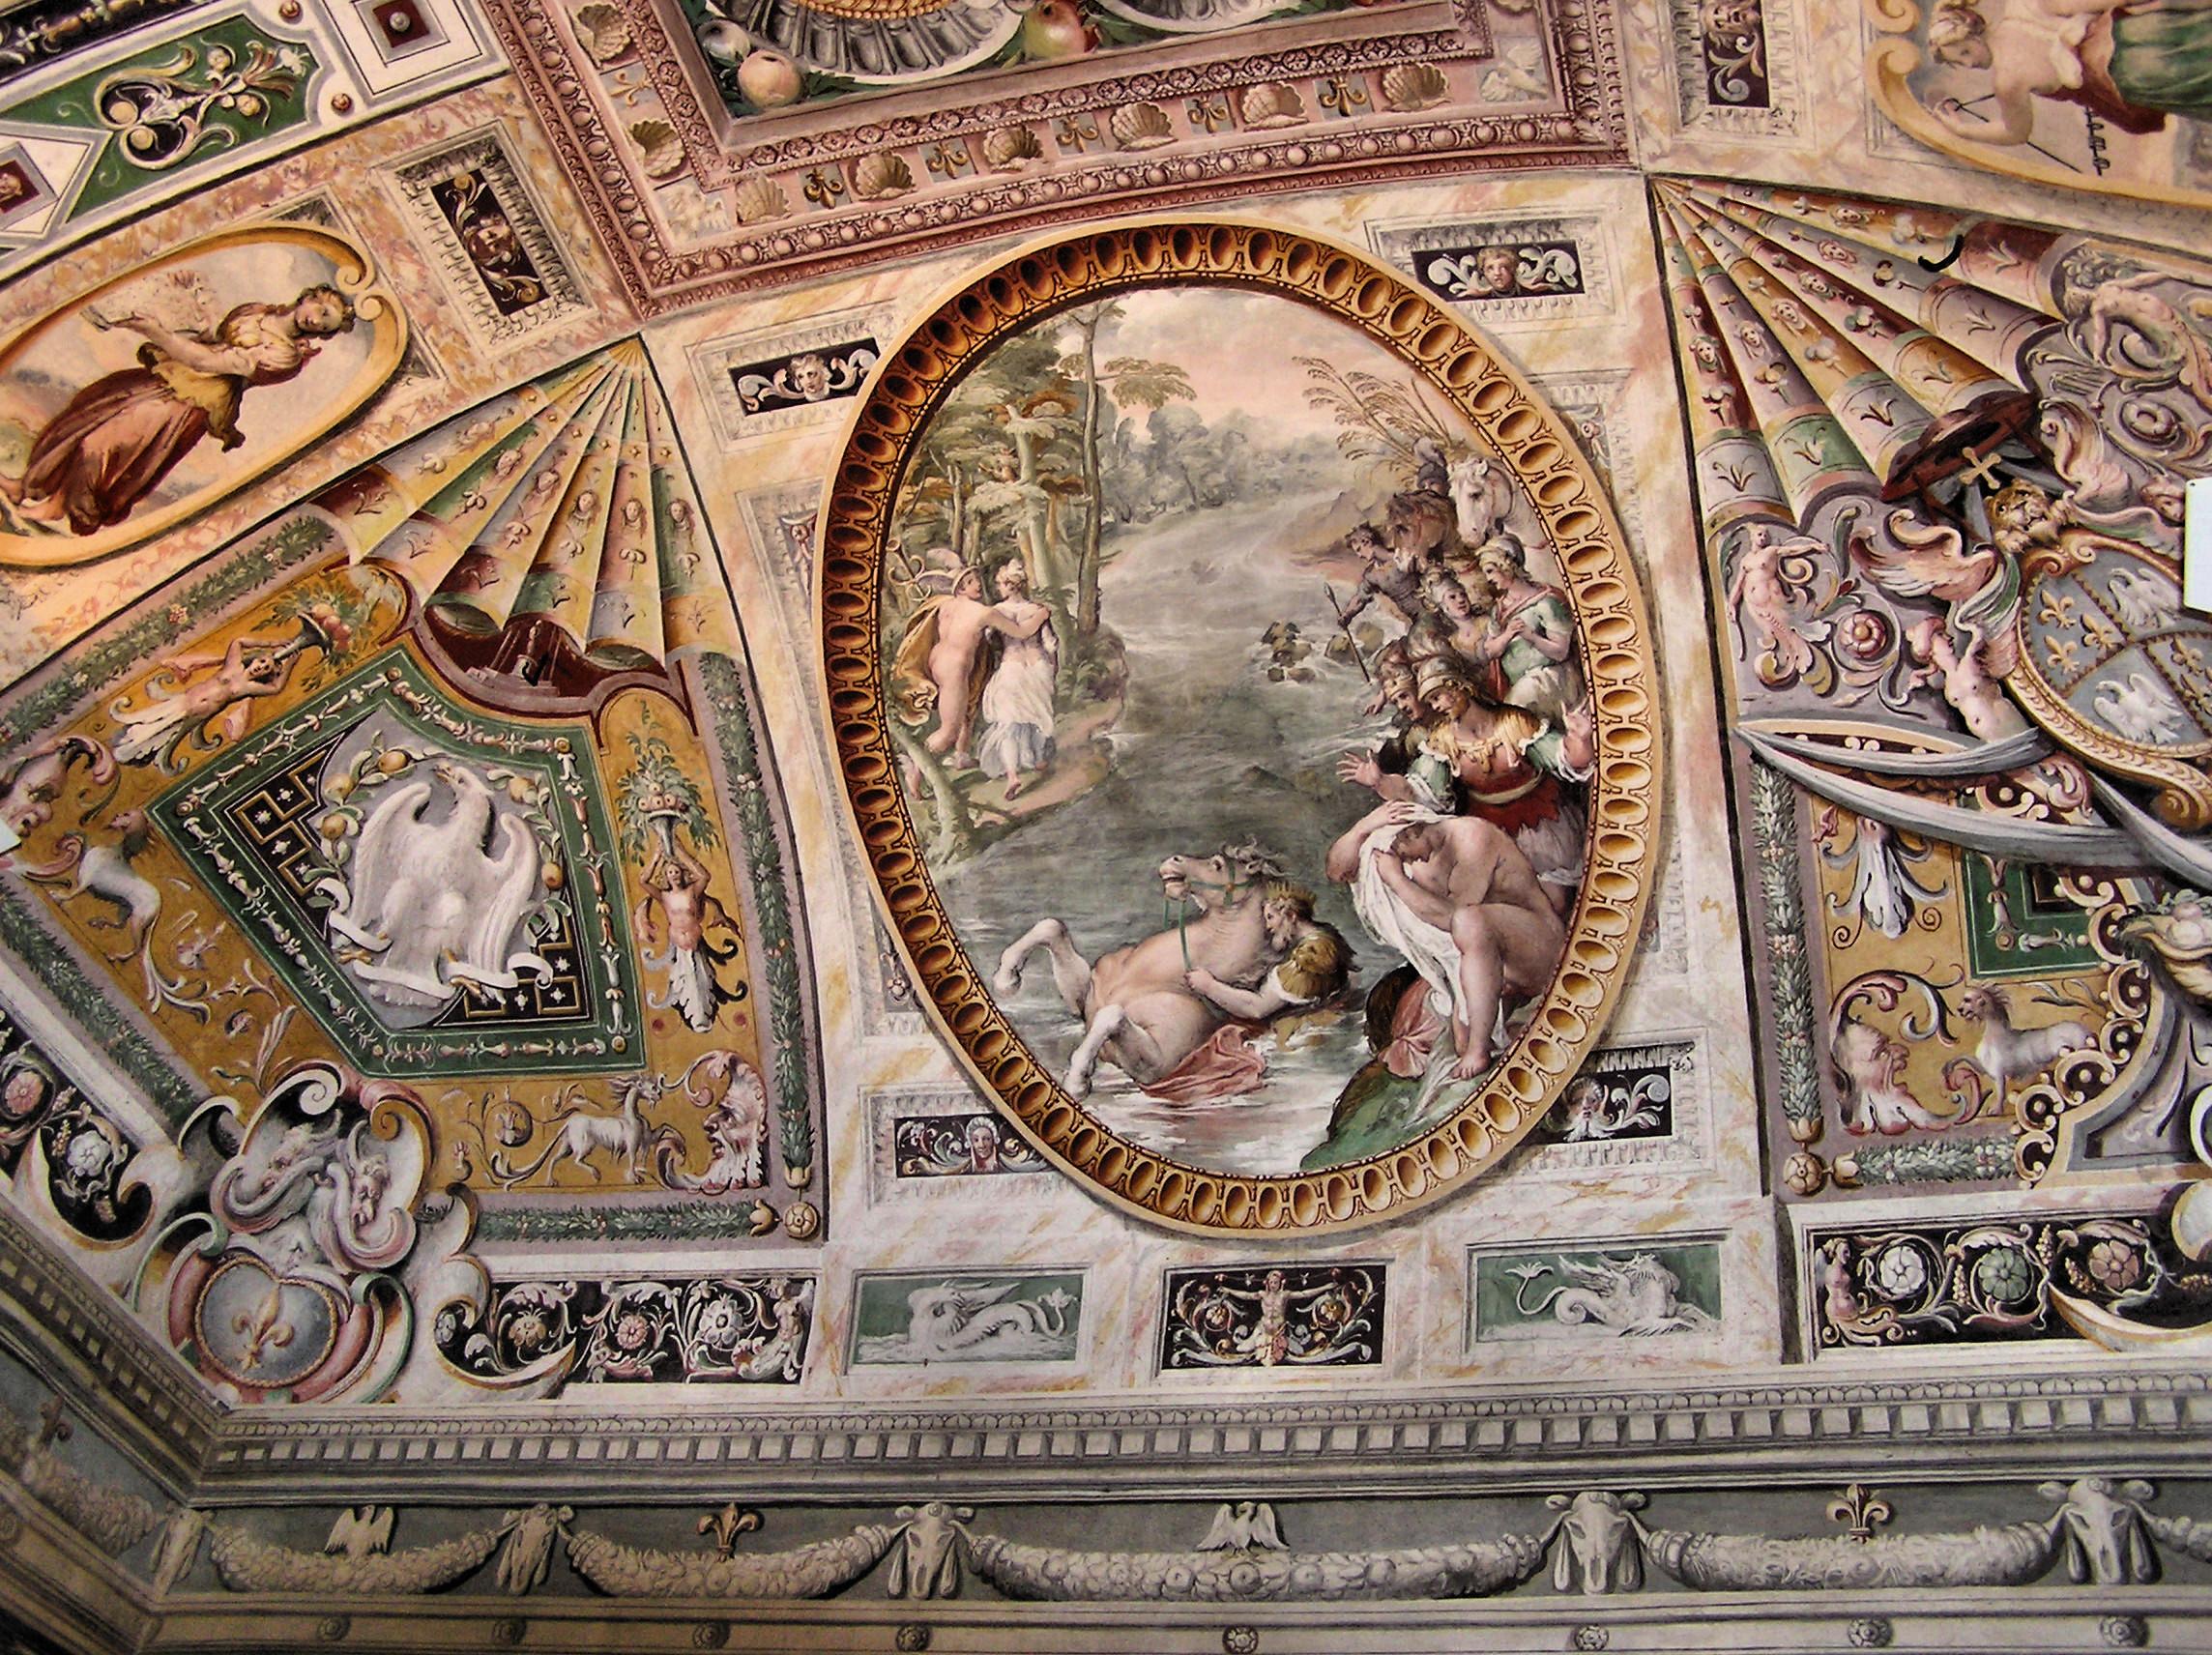 villa-d-este-at-tivoli-paintings-arp